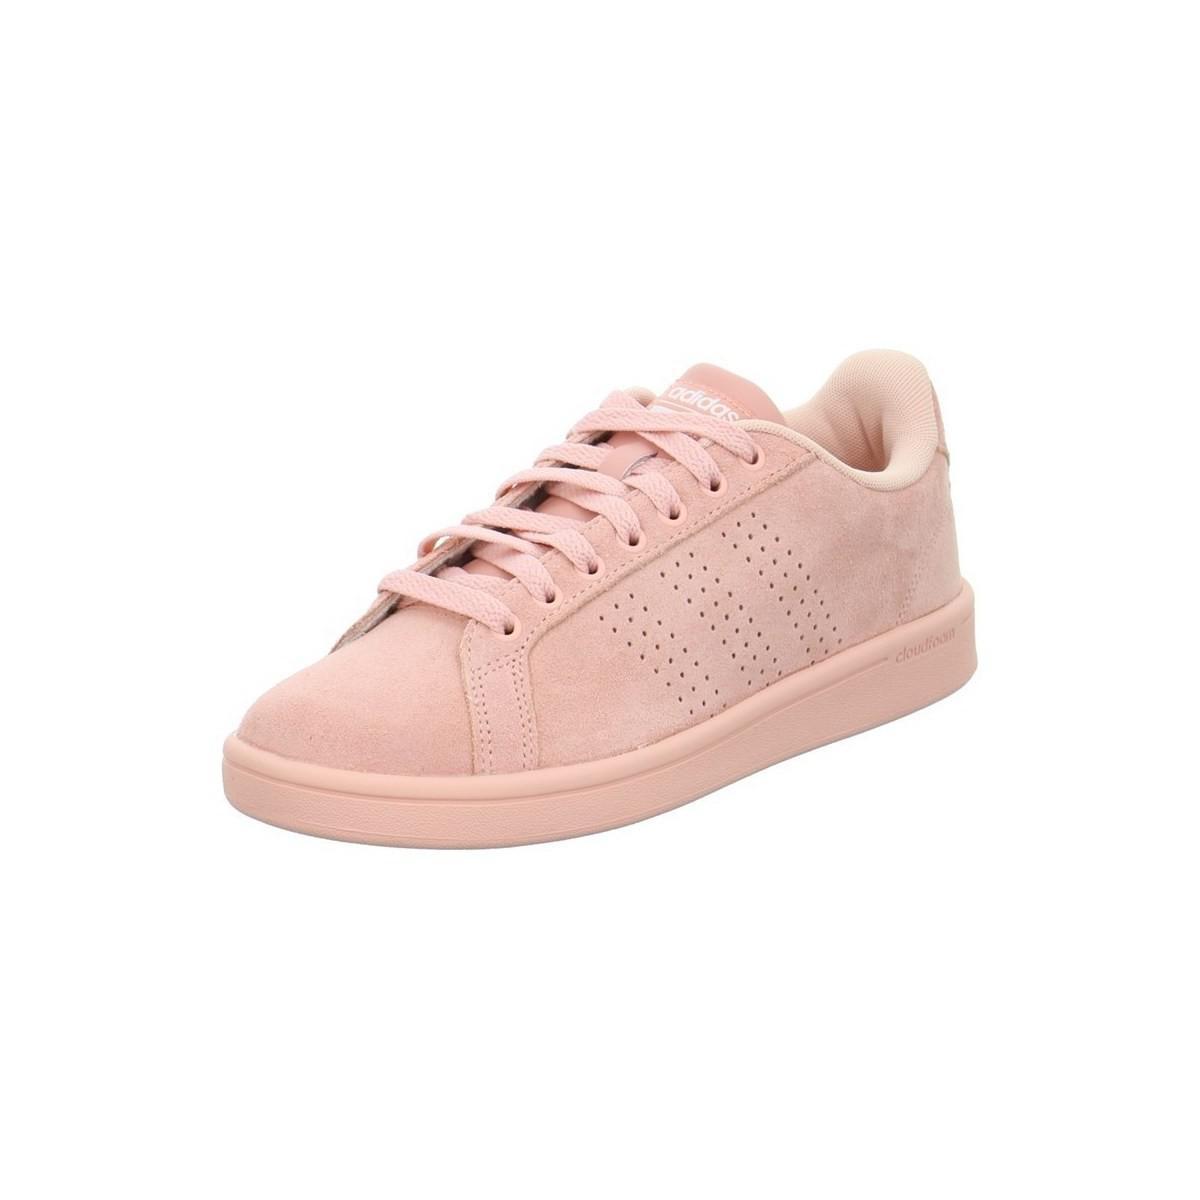 brand new d9c5d 1e479 adidas Cf Advantage Cl W Damen Sneaker Womens Shoes (trainer